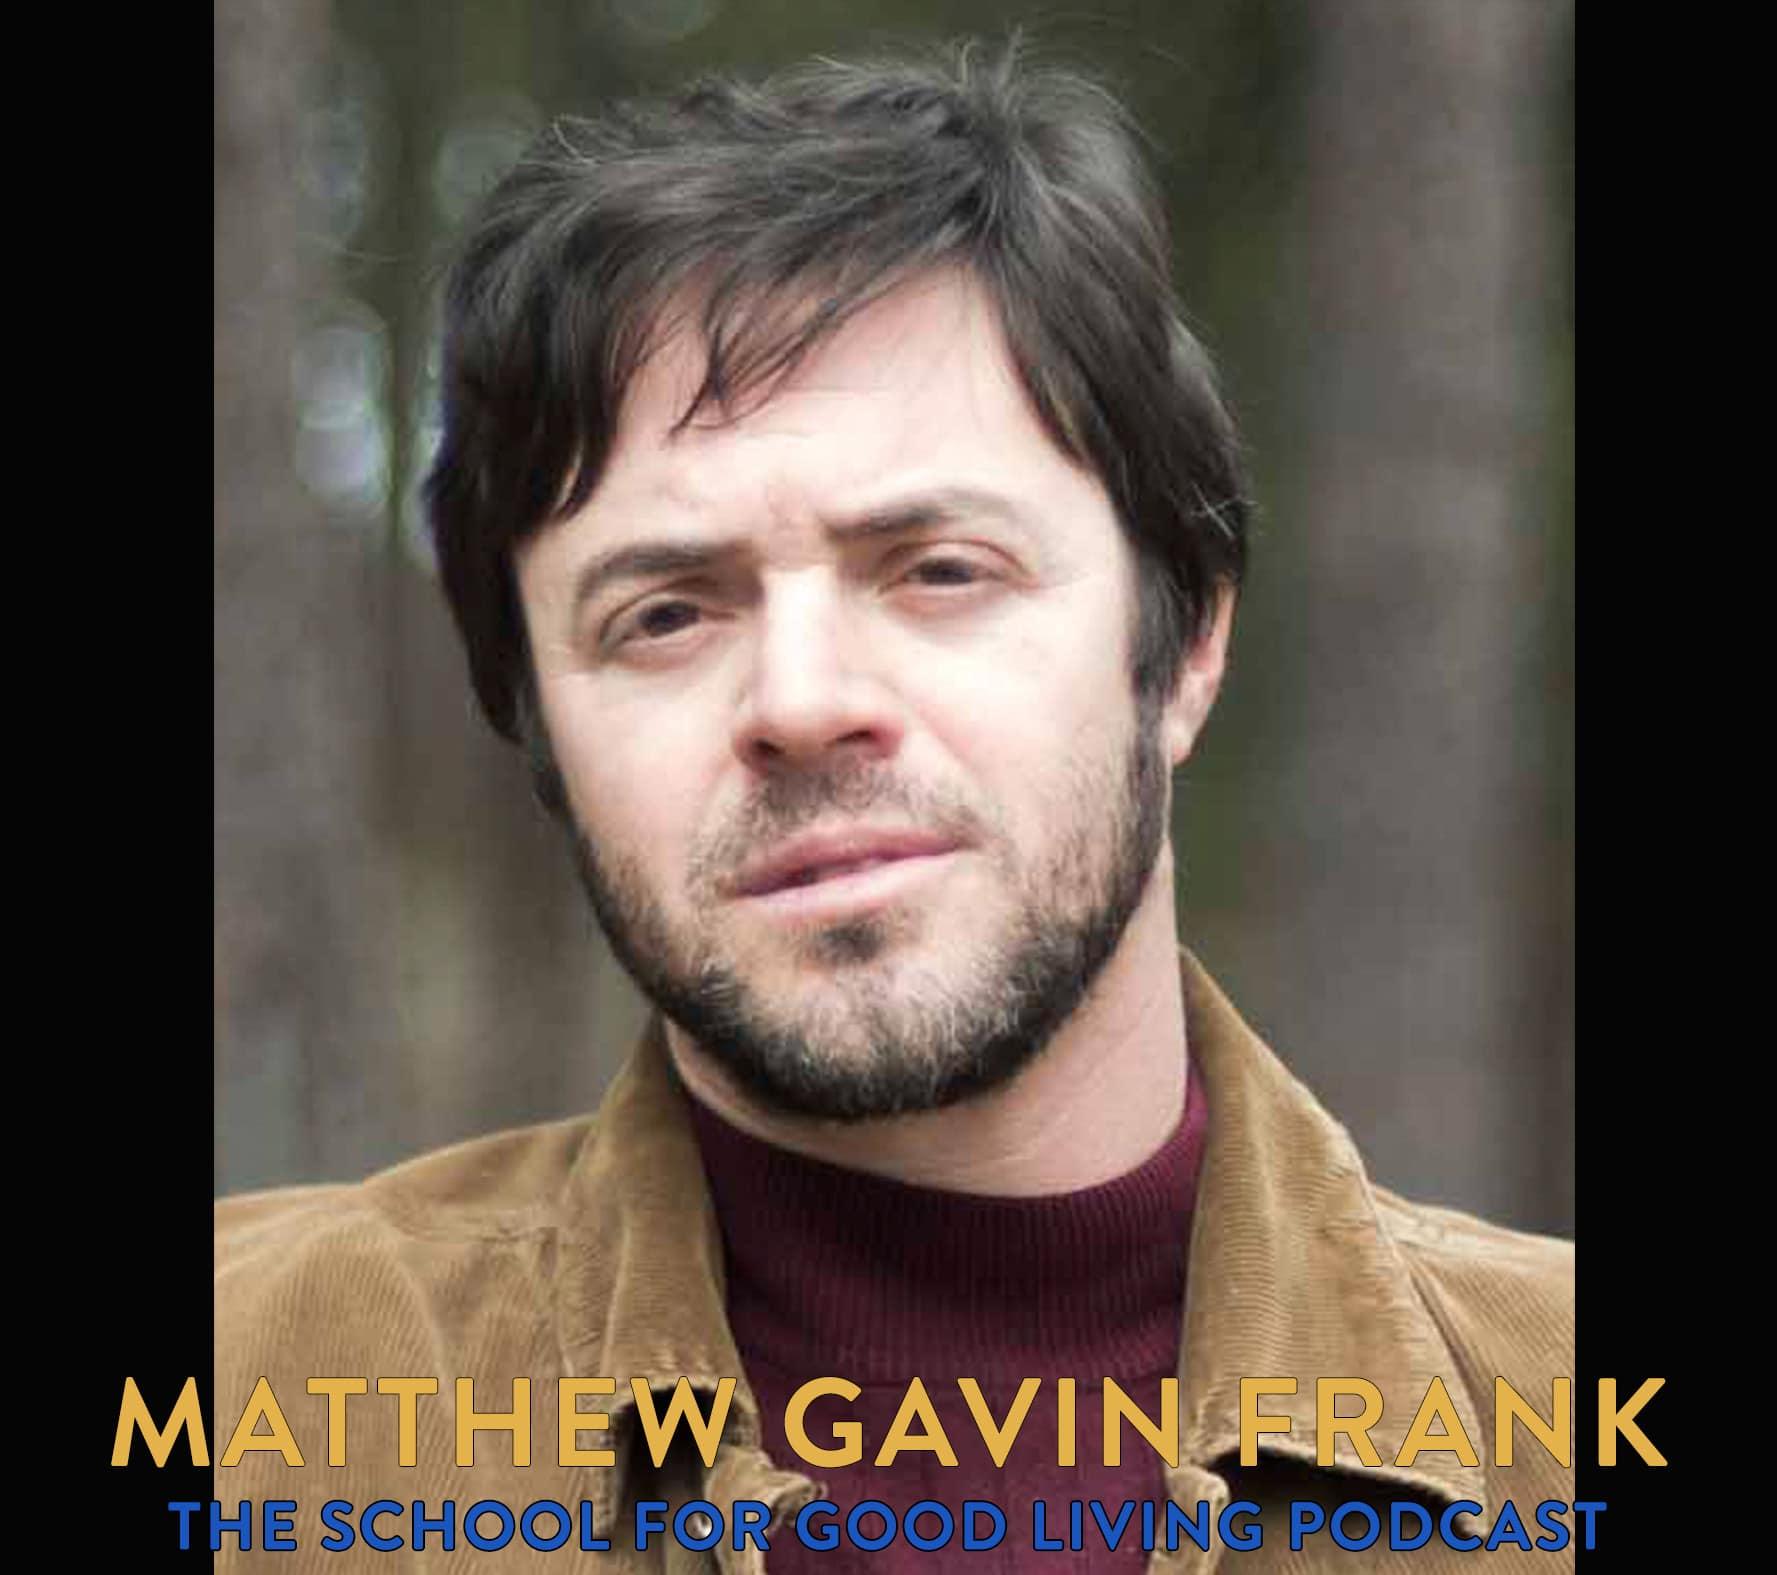 134.MatthewGavinFrank Insta Art